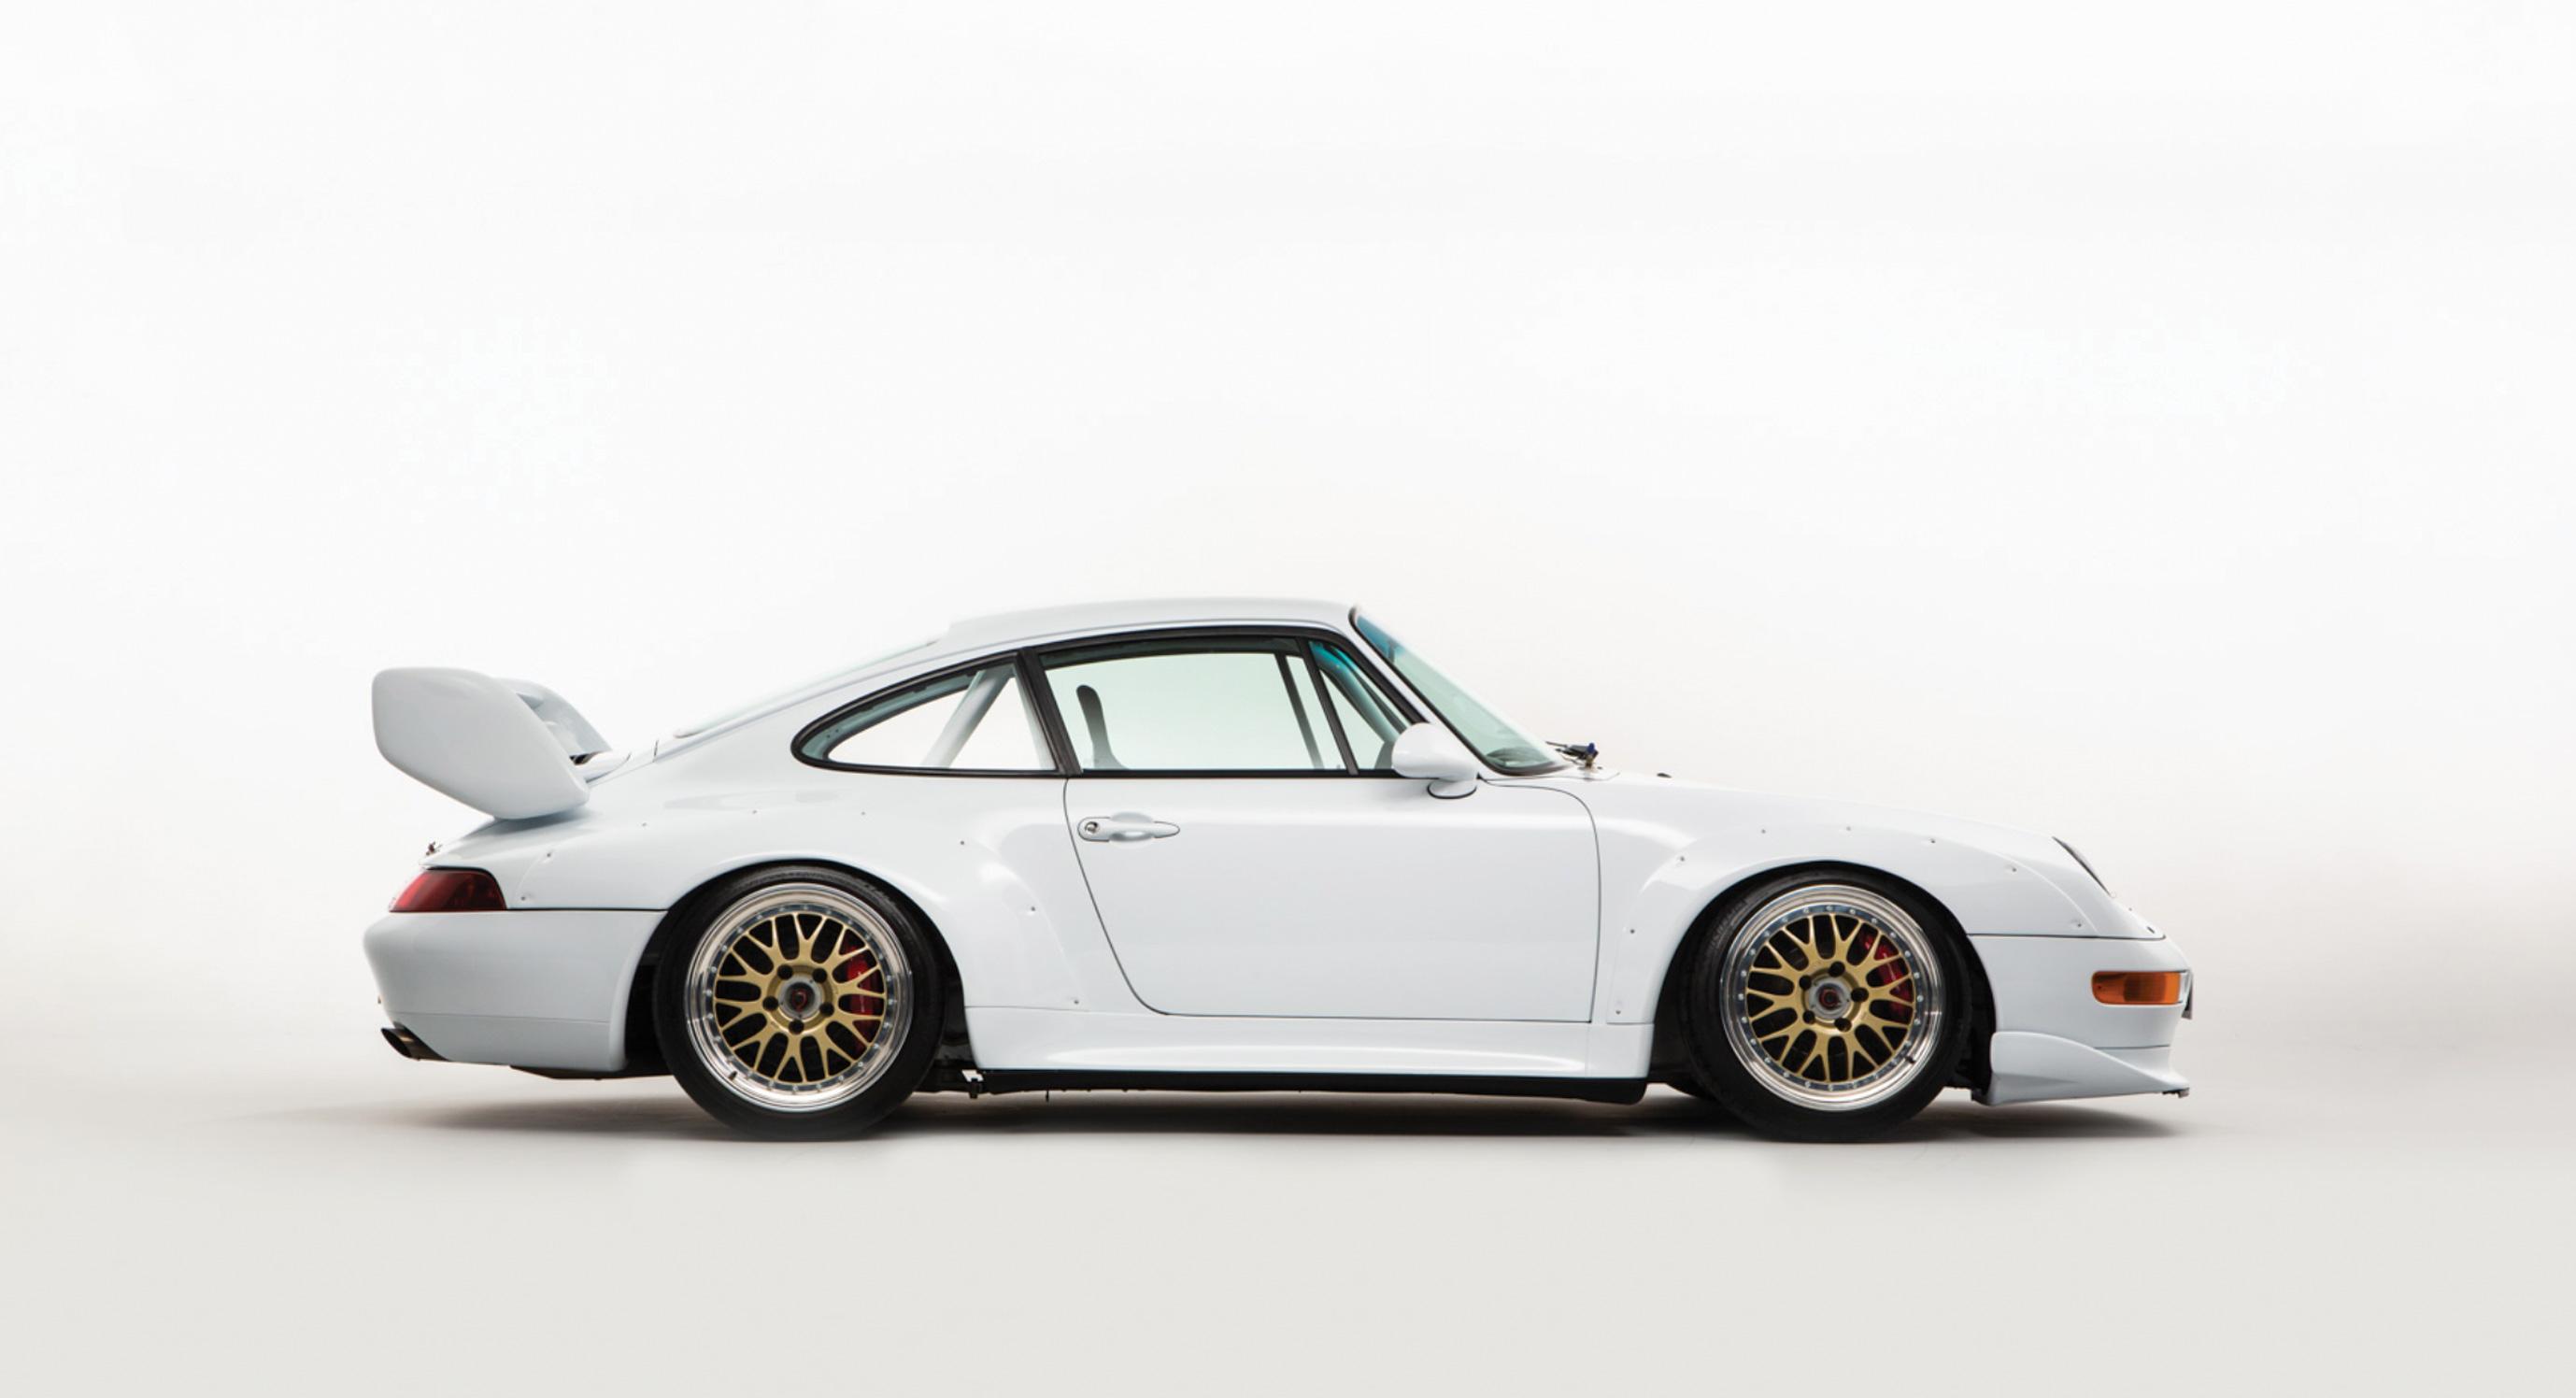 Classic Car Find of the Week: 1997 Porsche 993 3.8 RSR